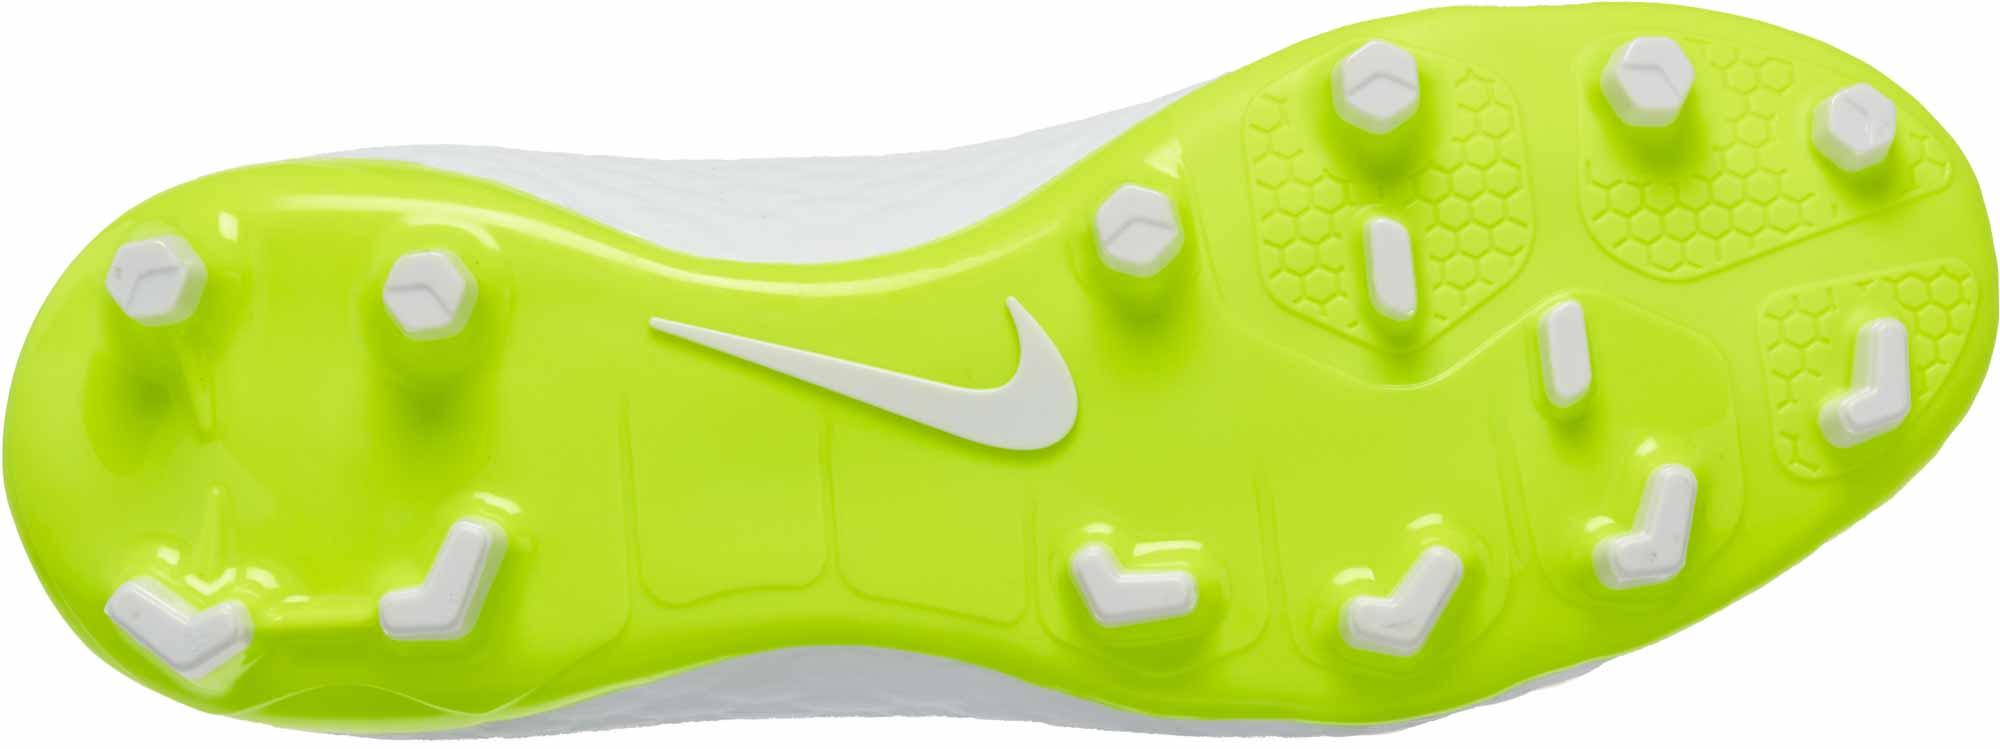 the best attitude f398a 22475 Nike Hypervenom Phantom III Academy DF FG – Youth – White Metallic Cool Grey